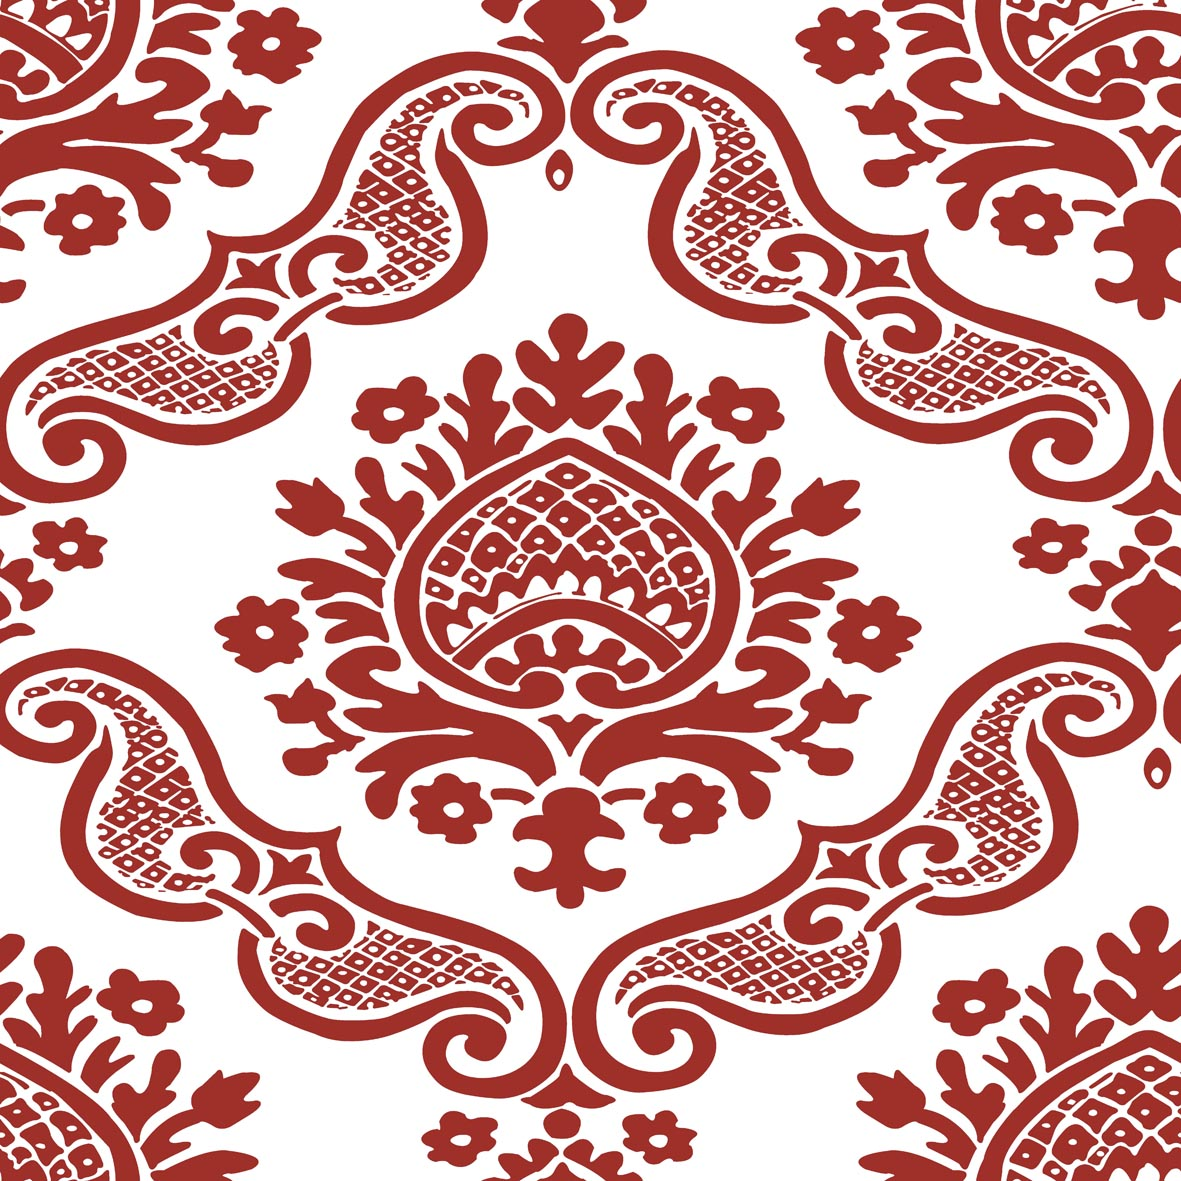 Papel mural vinilizado amarie 32 2 cinthiasa for Papel decomural muresco